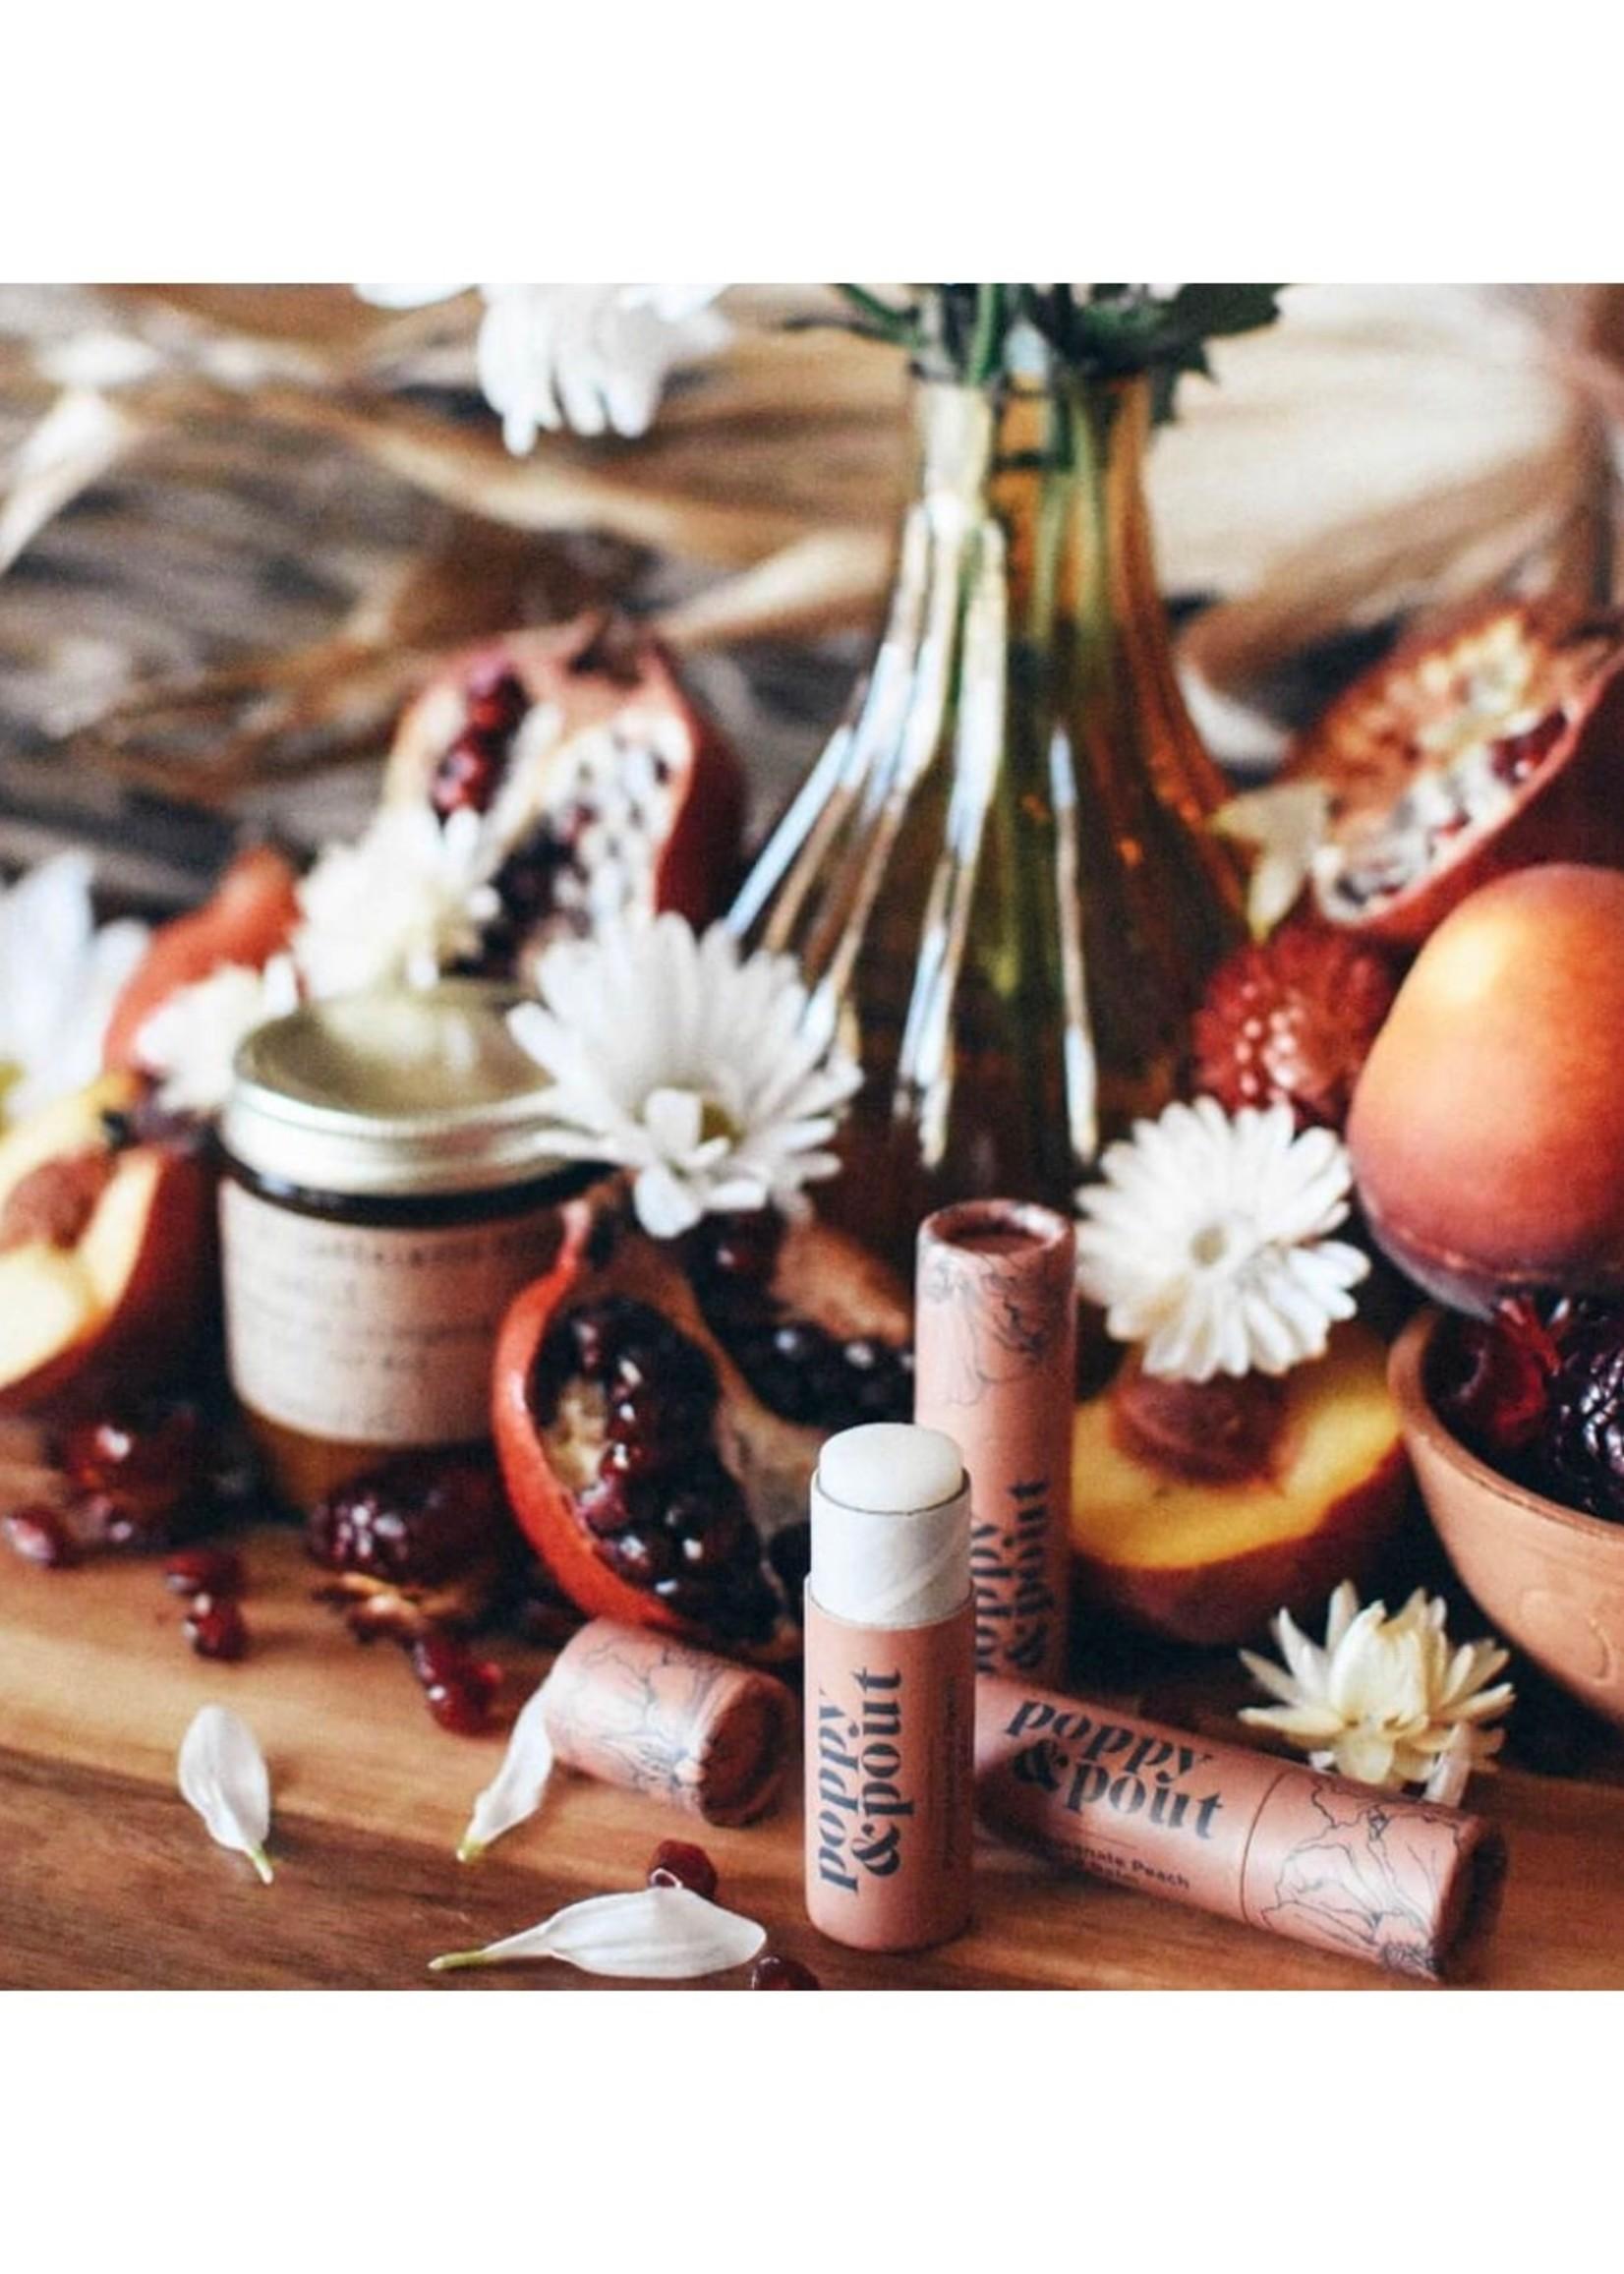 POPPY & POUT Pomegranate Peach Lip Balm